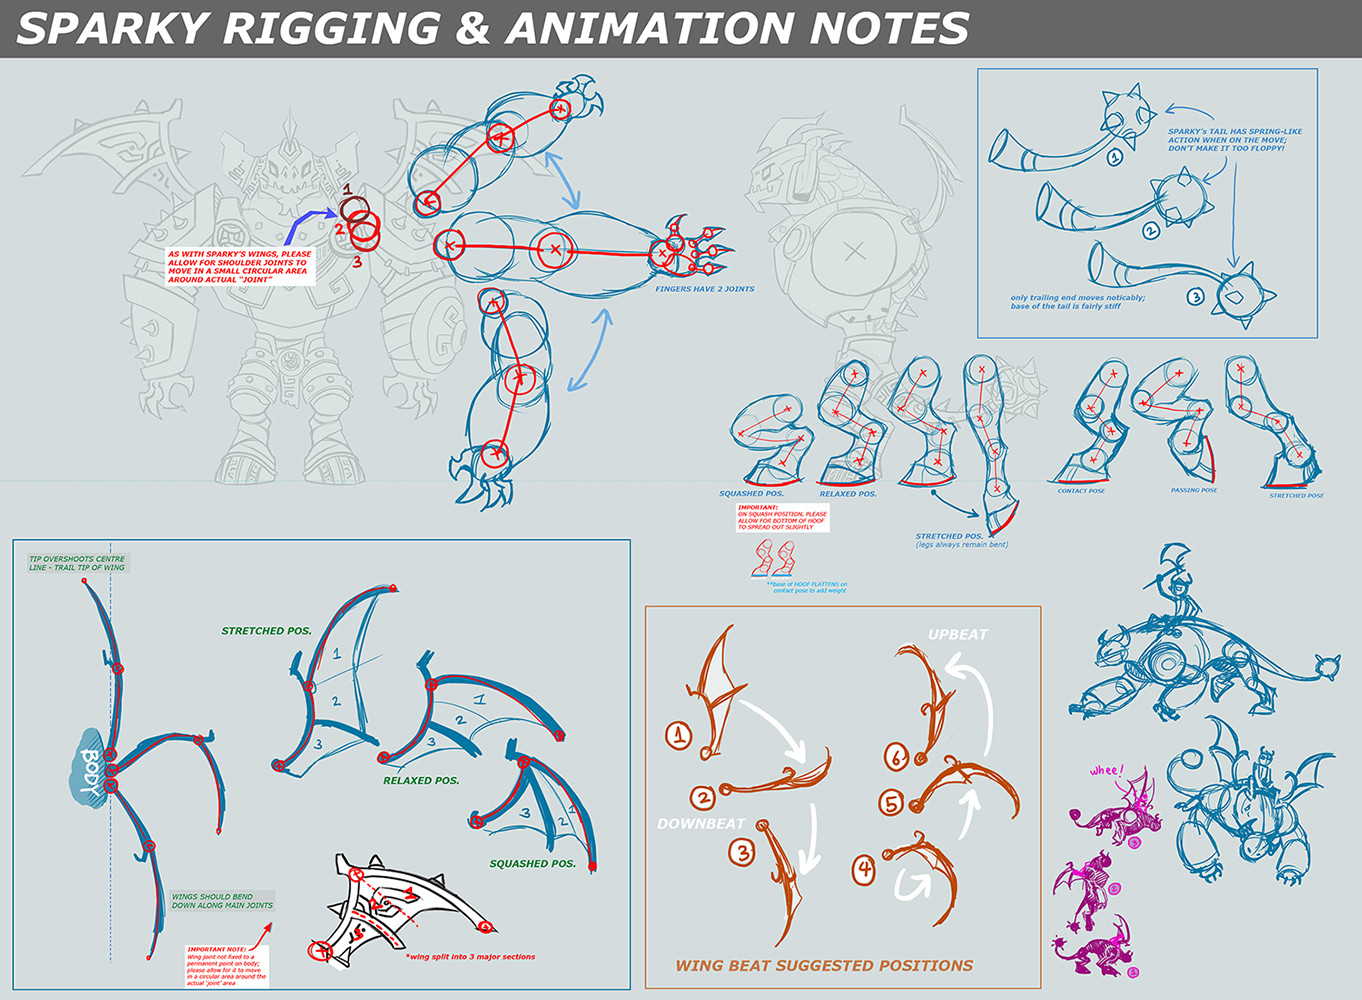 Jose cua sparky rigging animation notesb